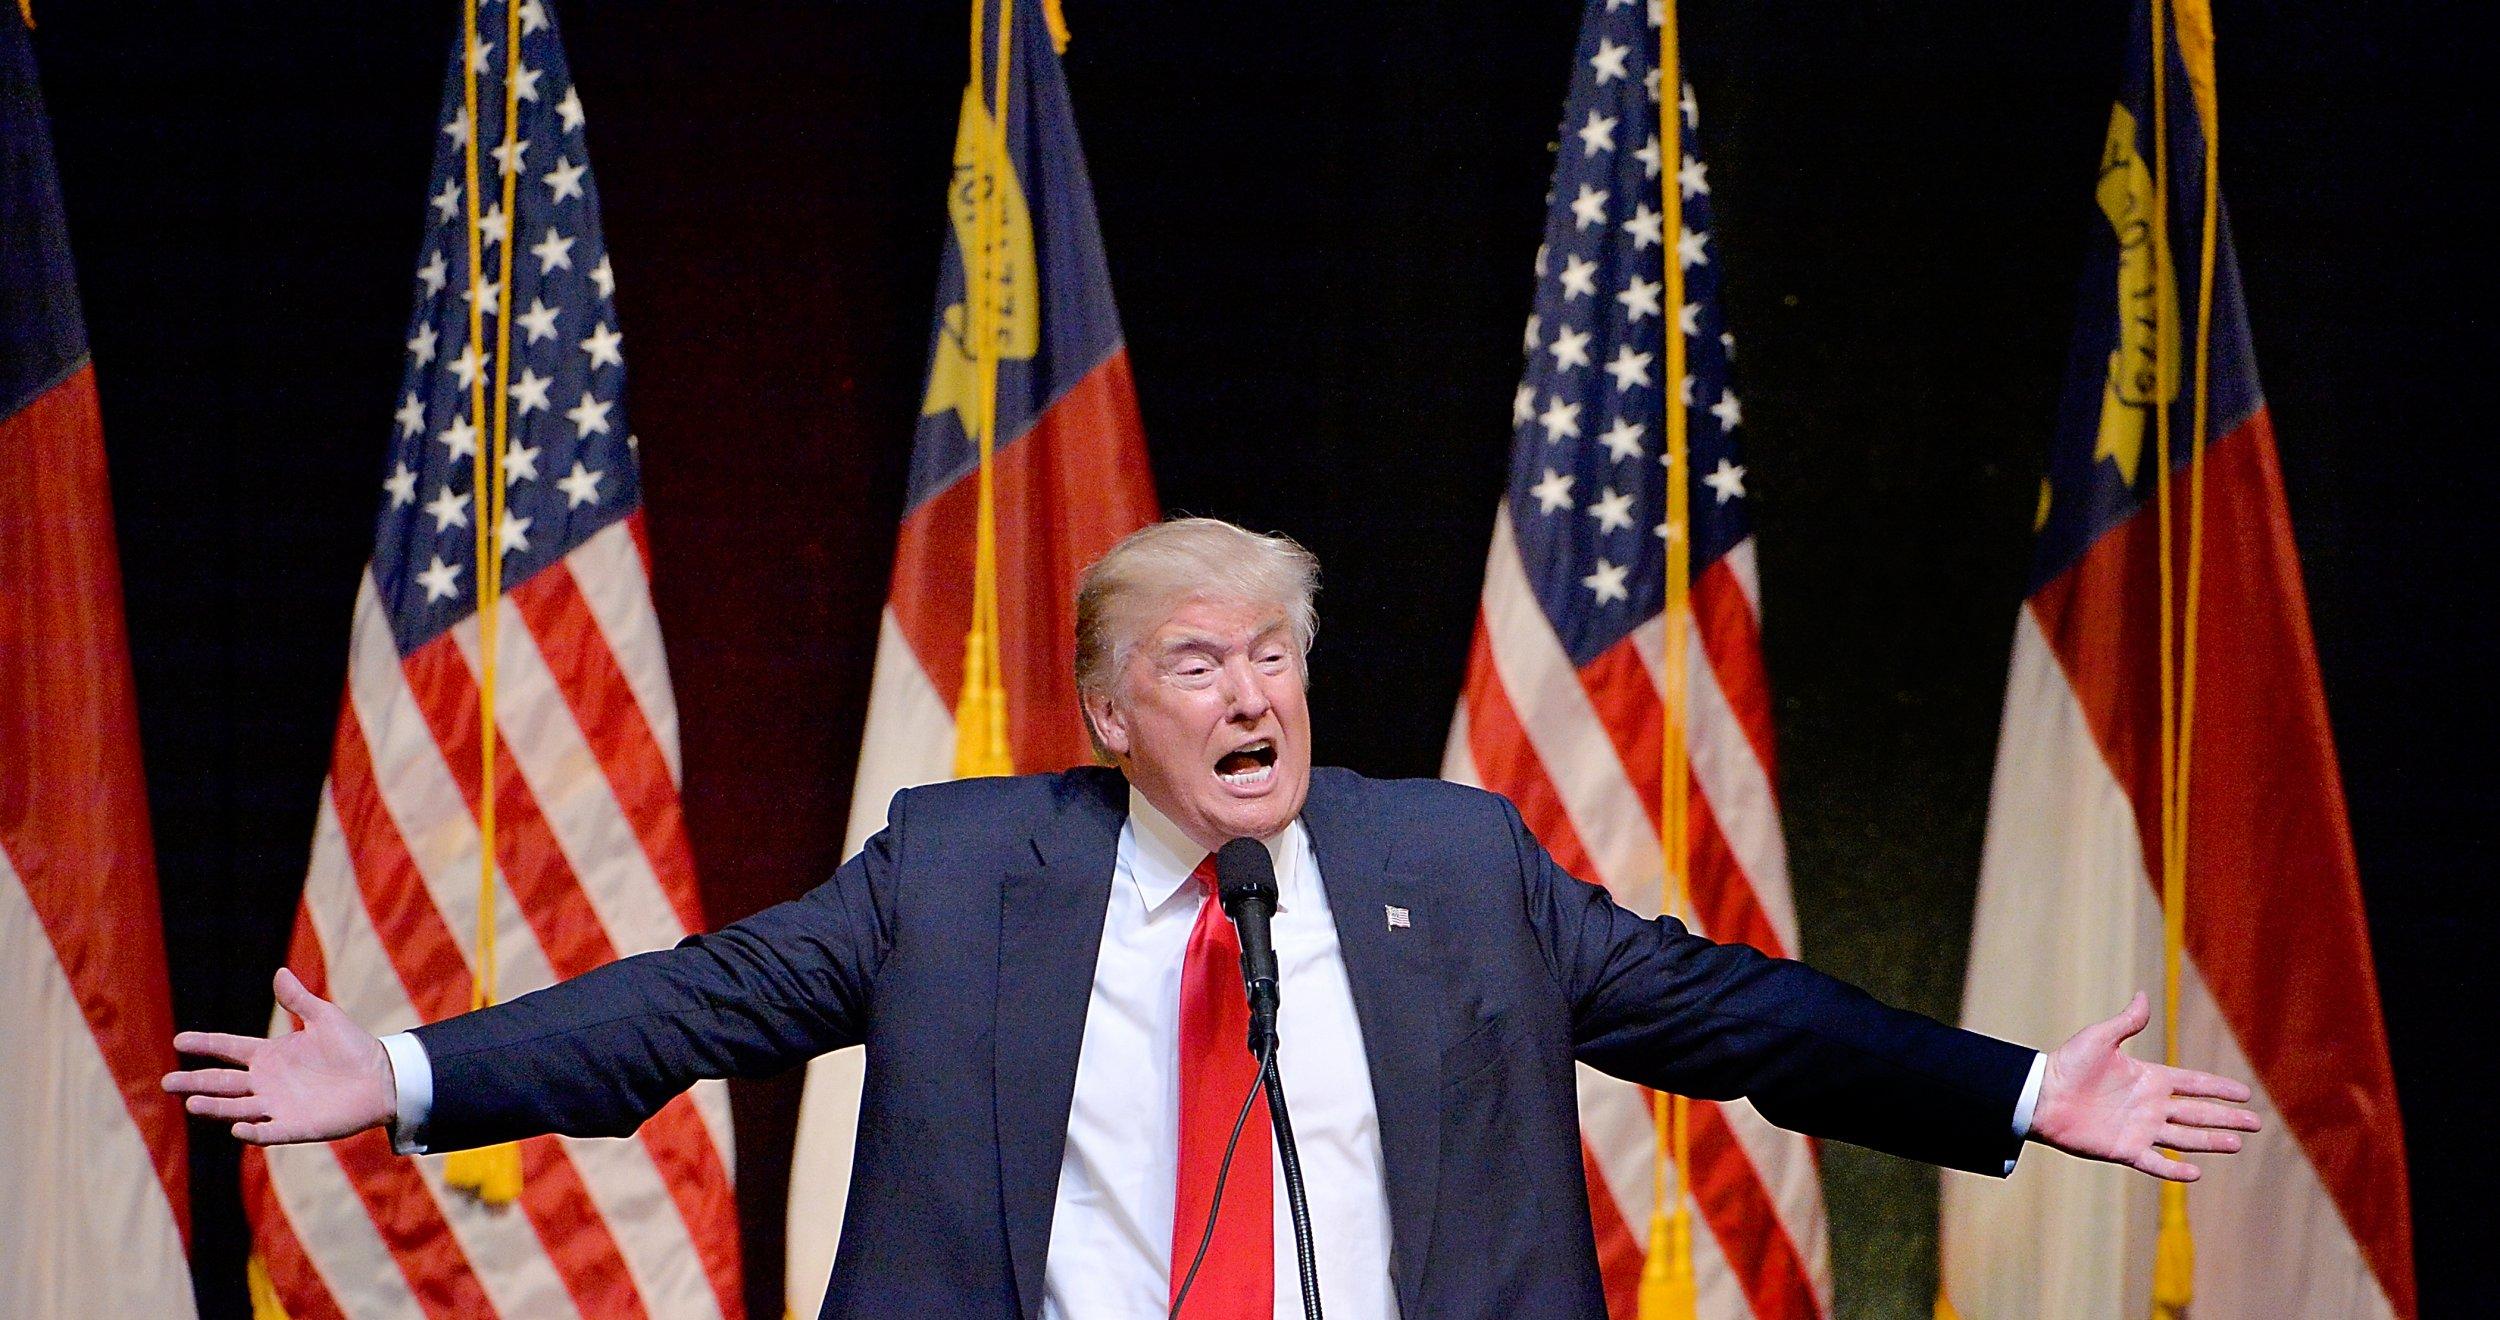 Donald Trump North Carolina